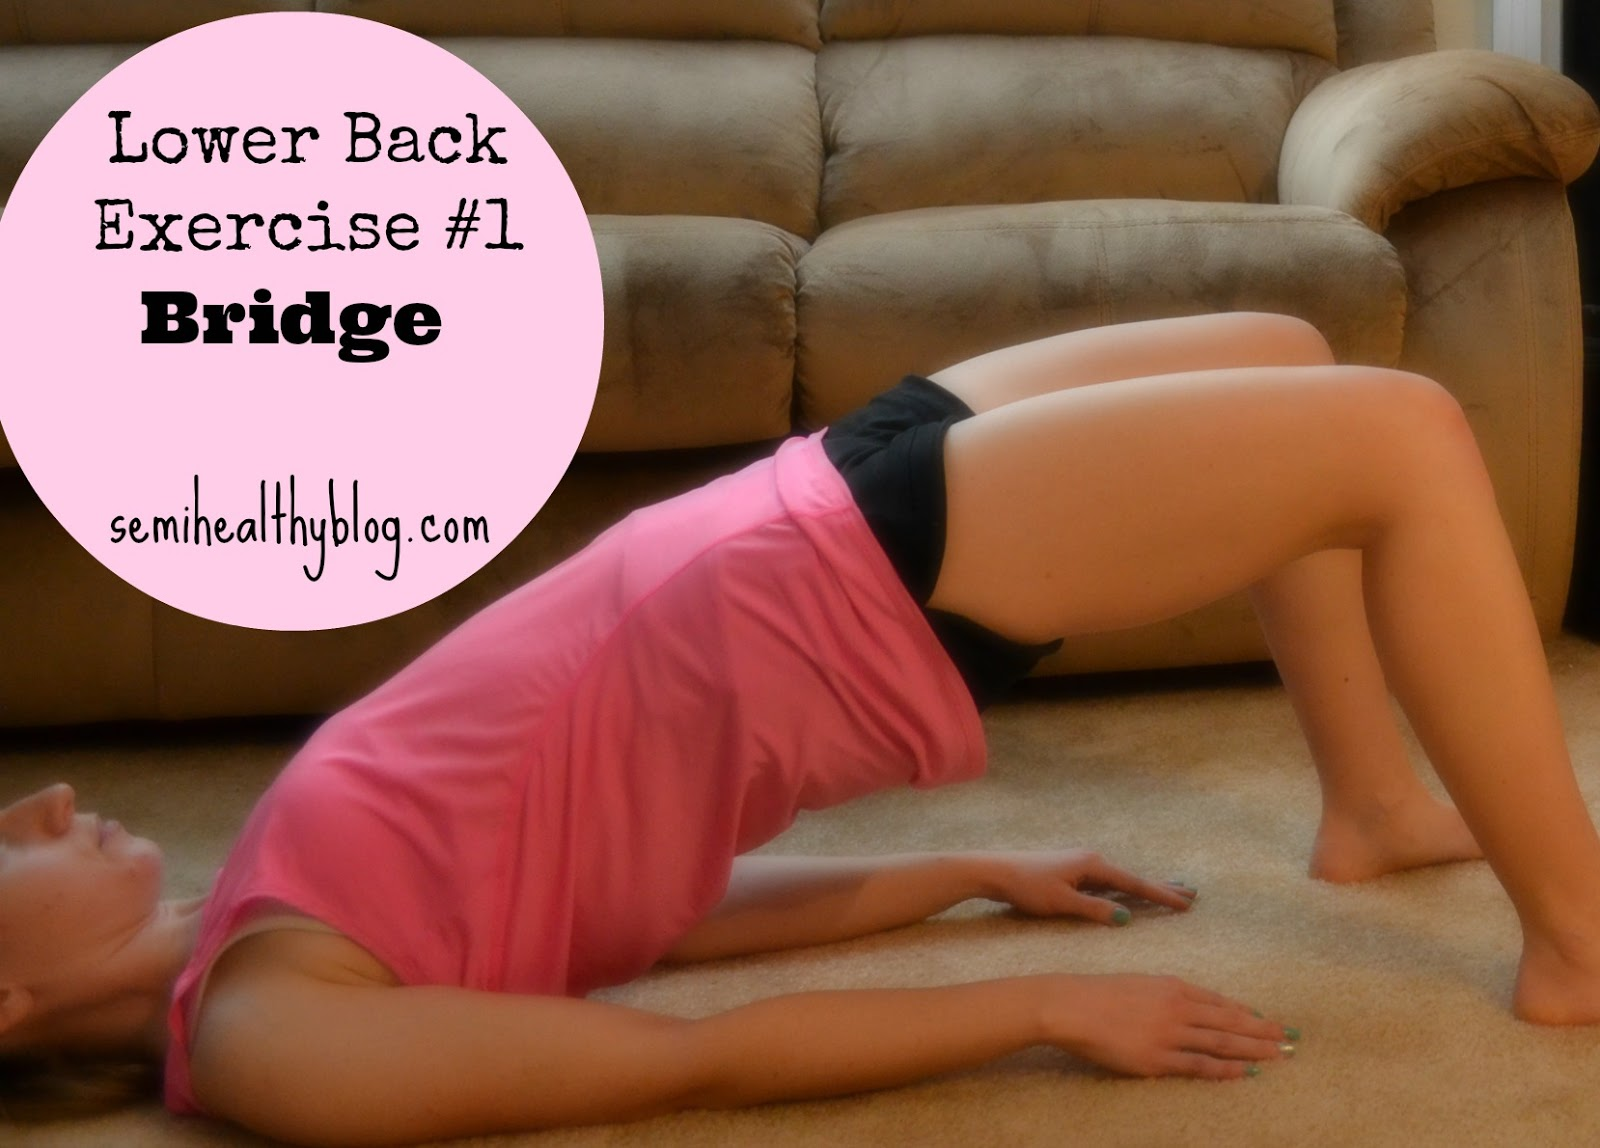 Lower Back Exercises Exercises: